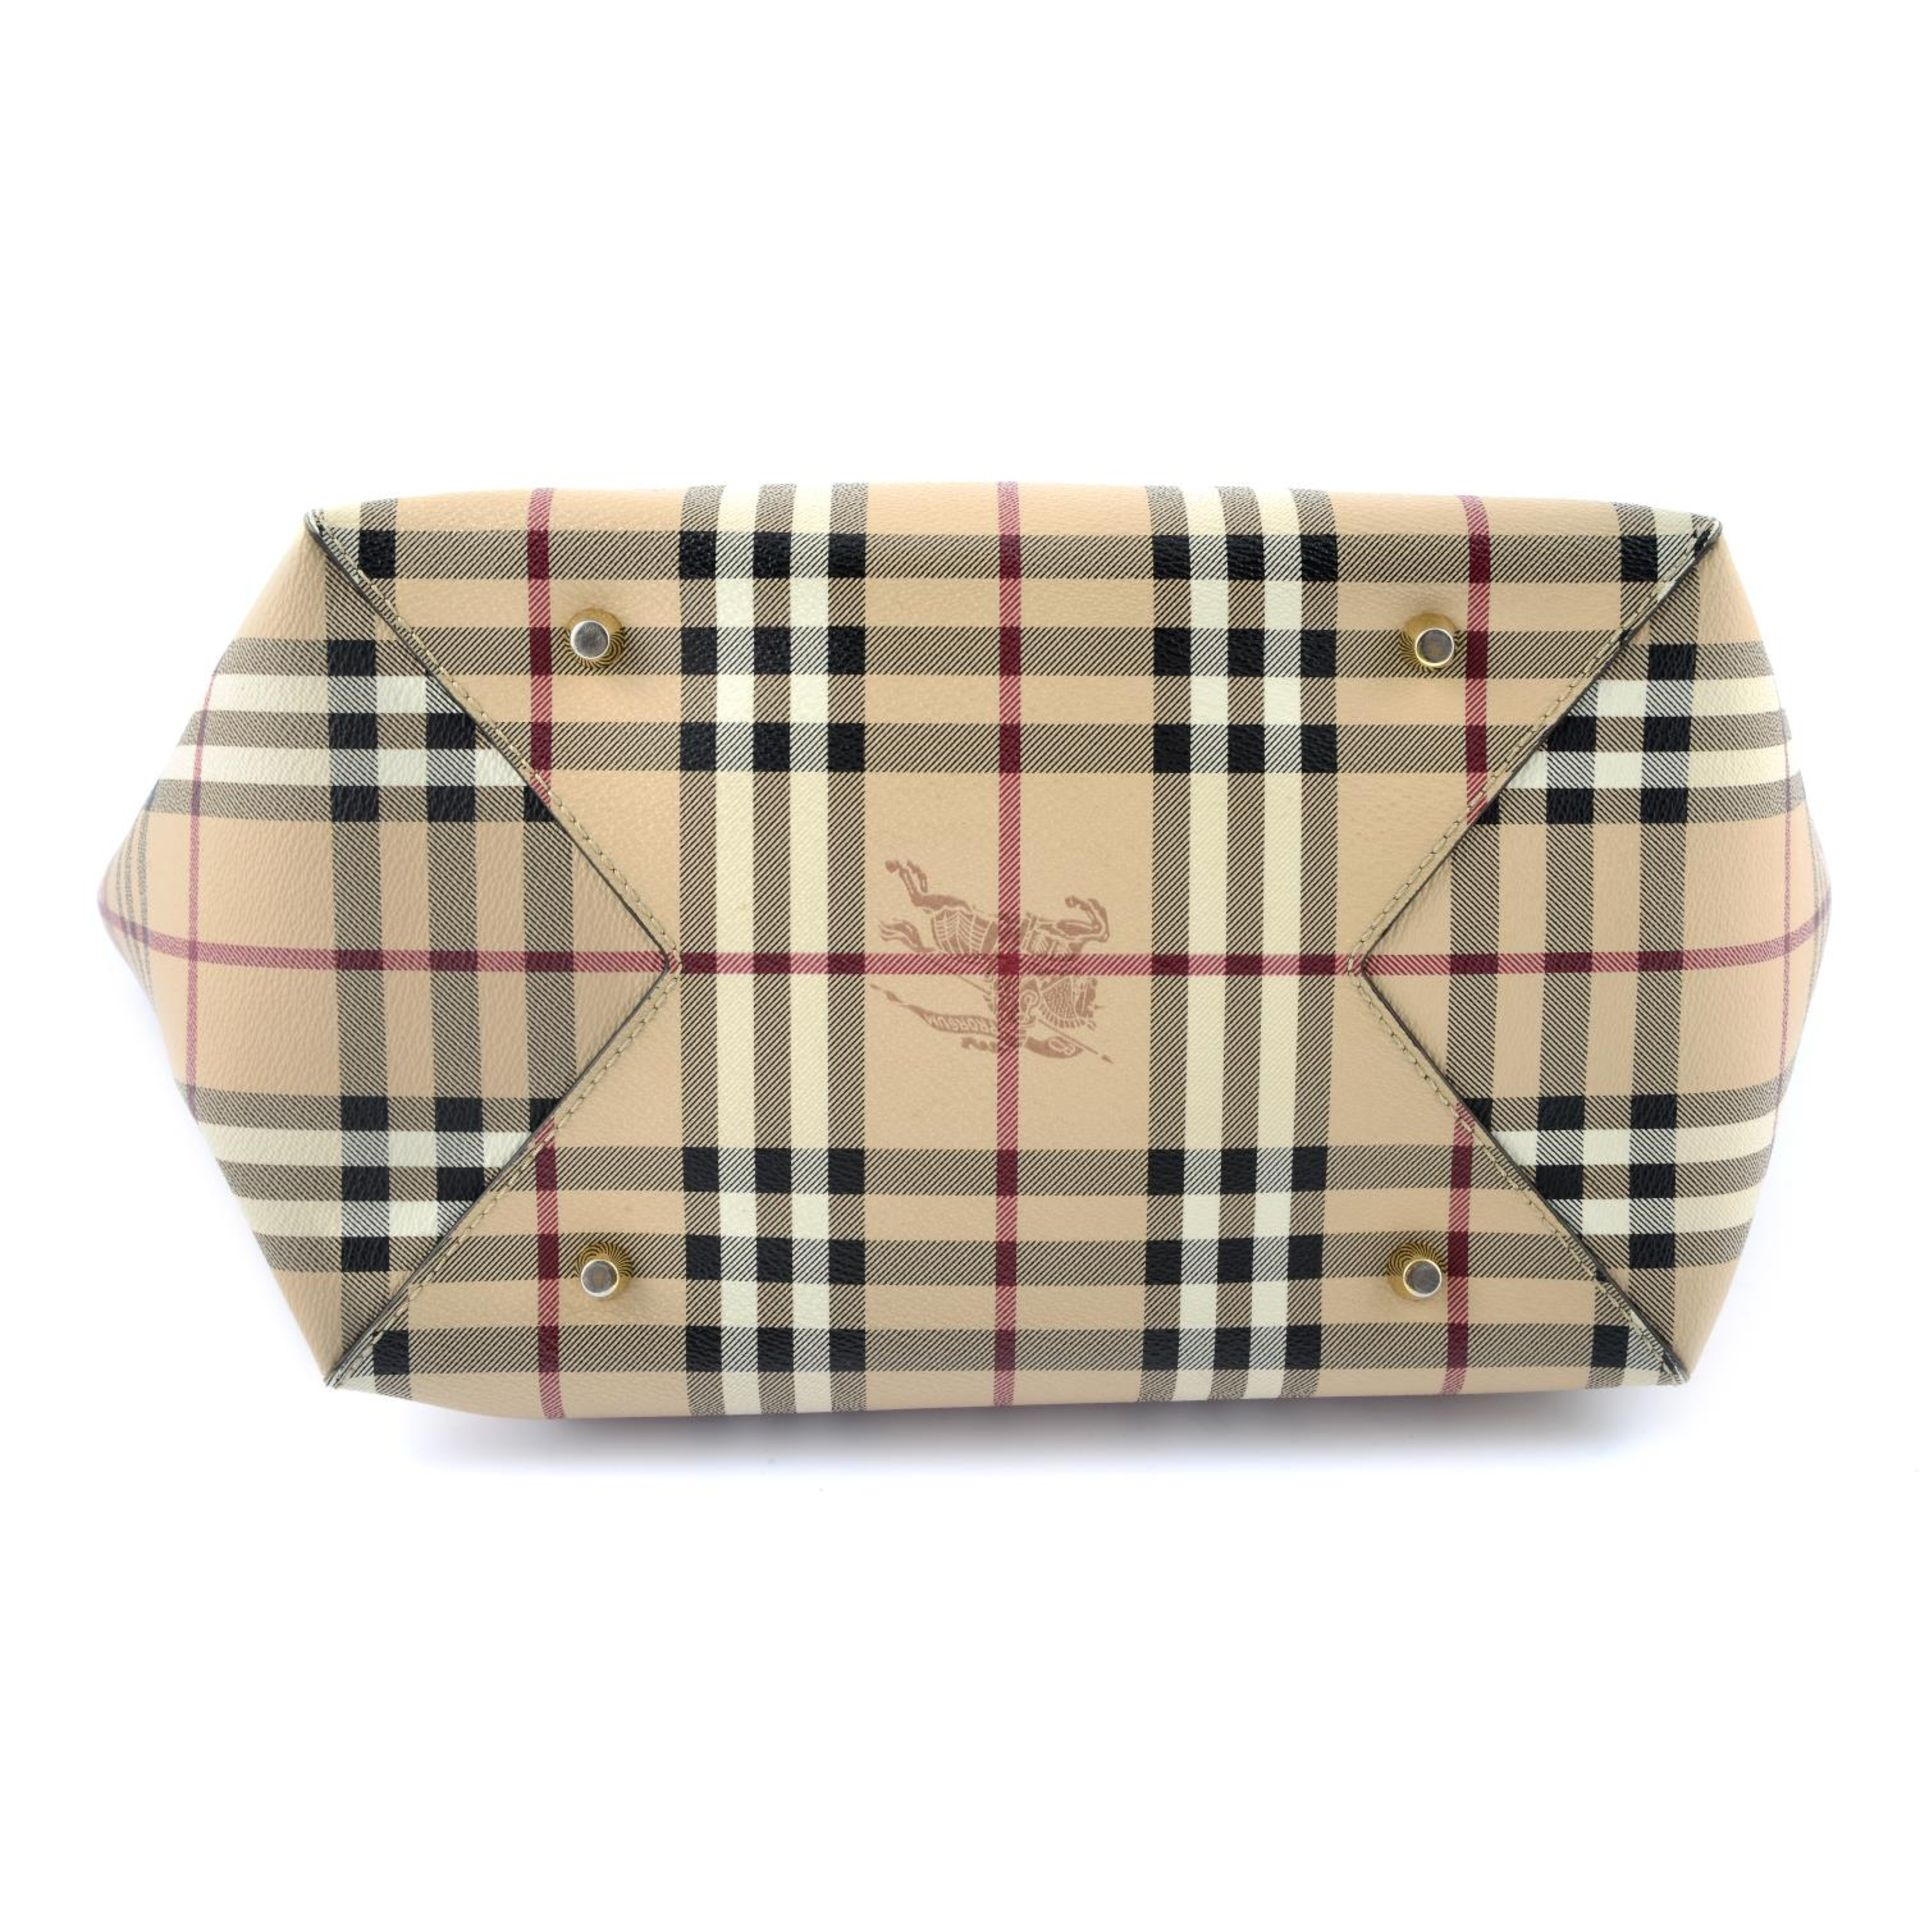 BURBERRY - a Haymarket Check handbag. - Image 4 of 4